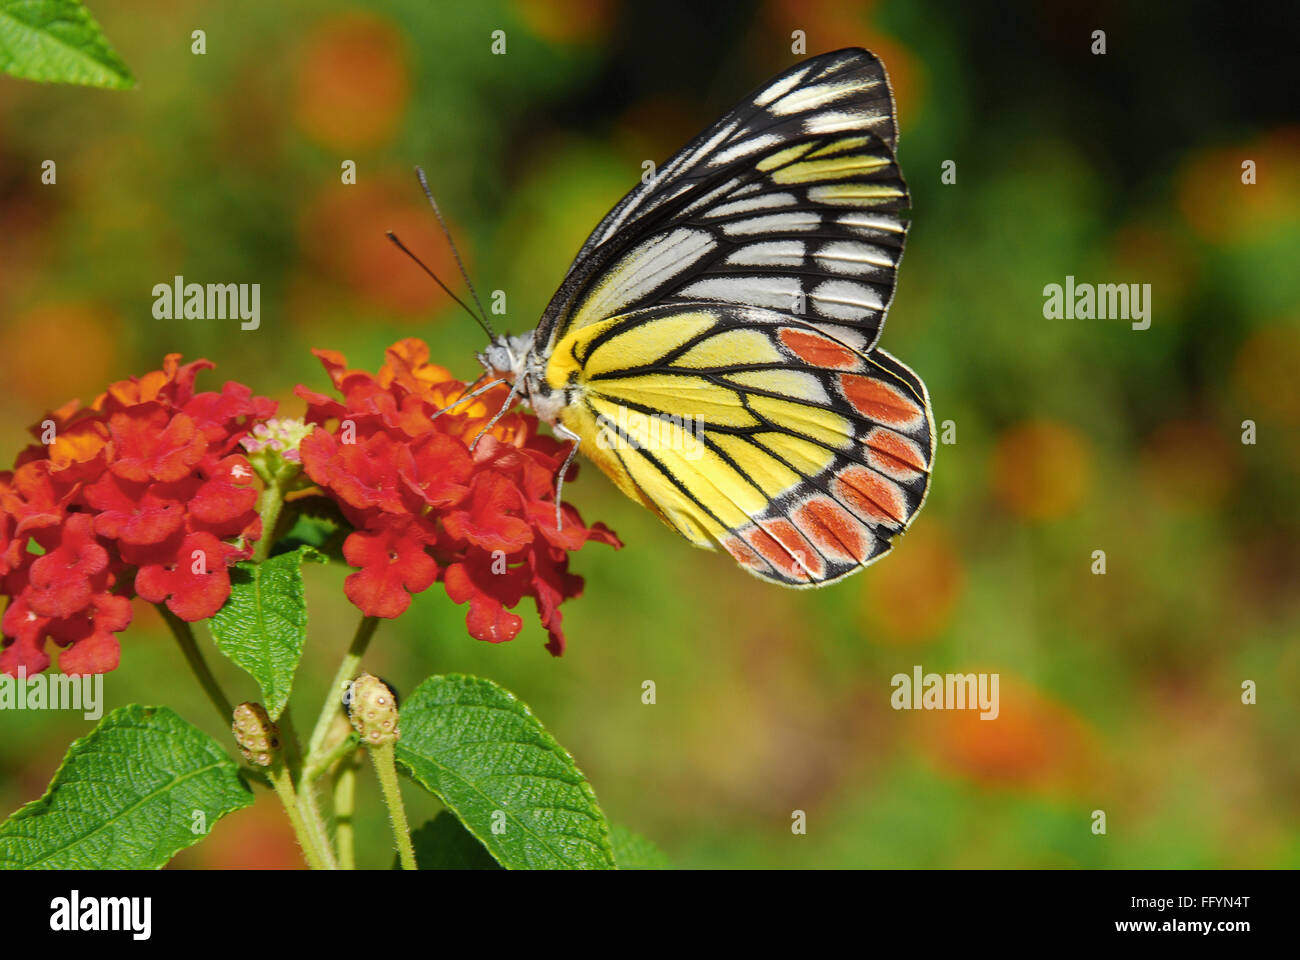 Jézabel commun Butterfly Park Bangalore Karnataka Inde Asie Bannerghatta Photo Stock